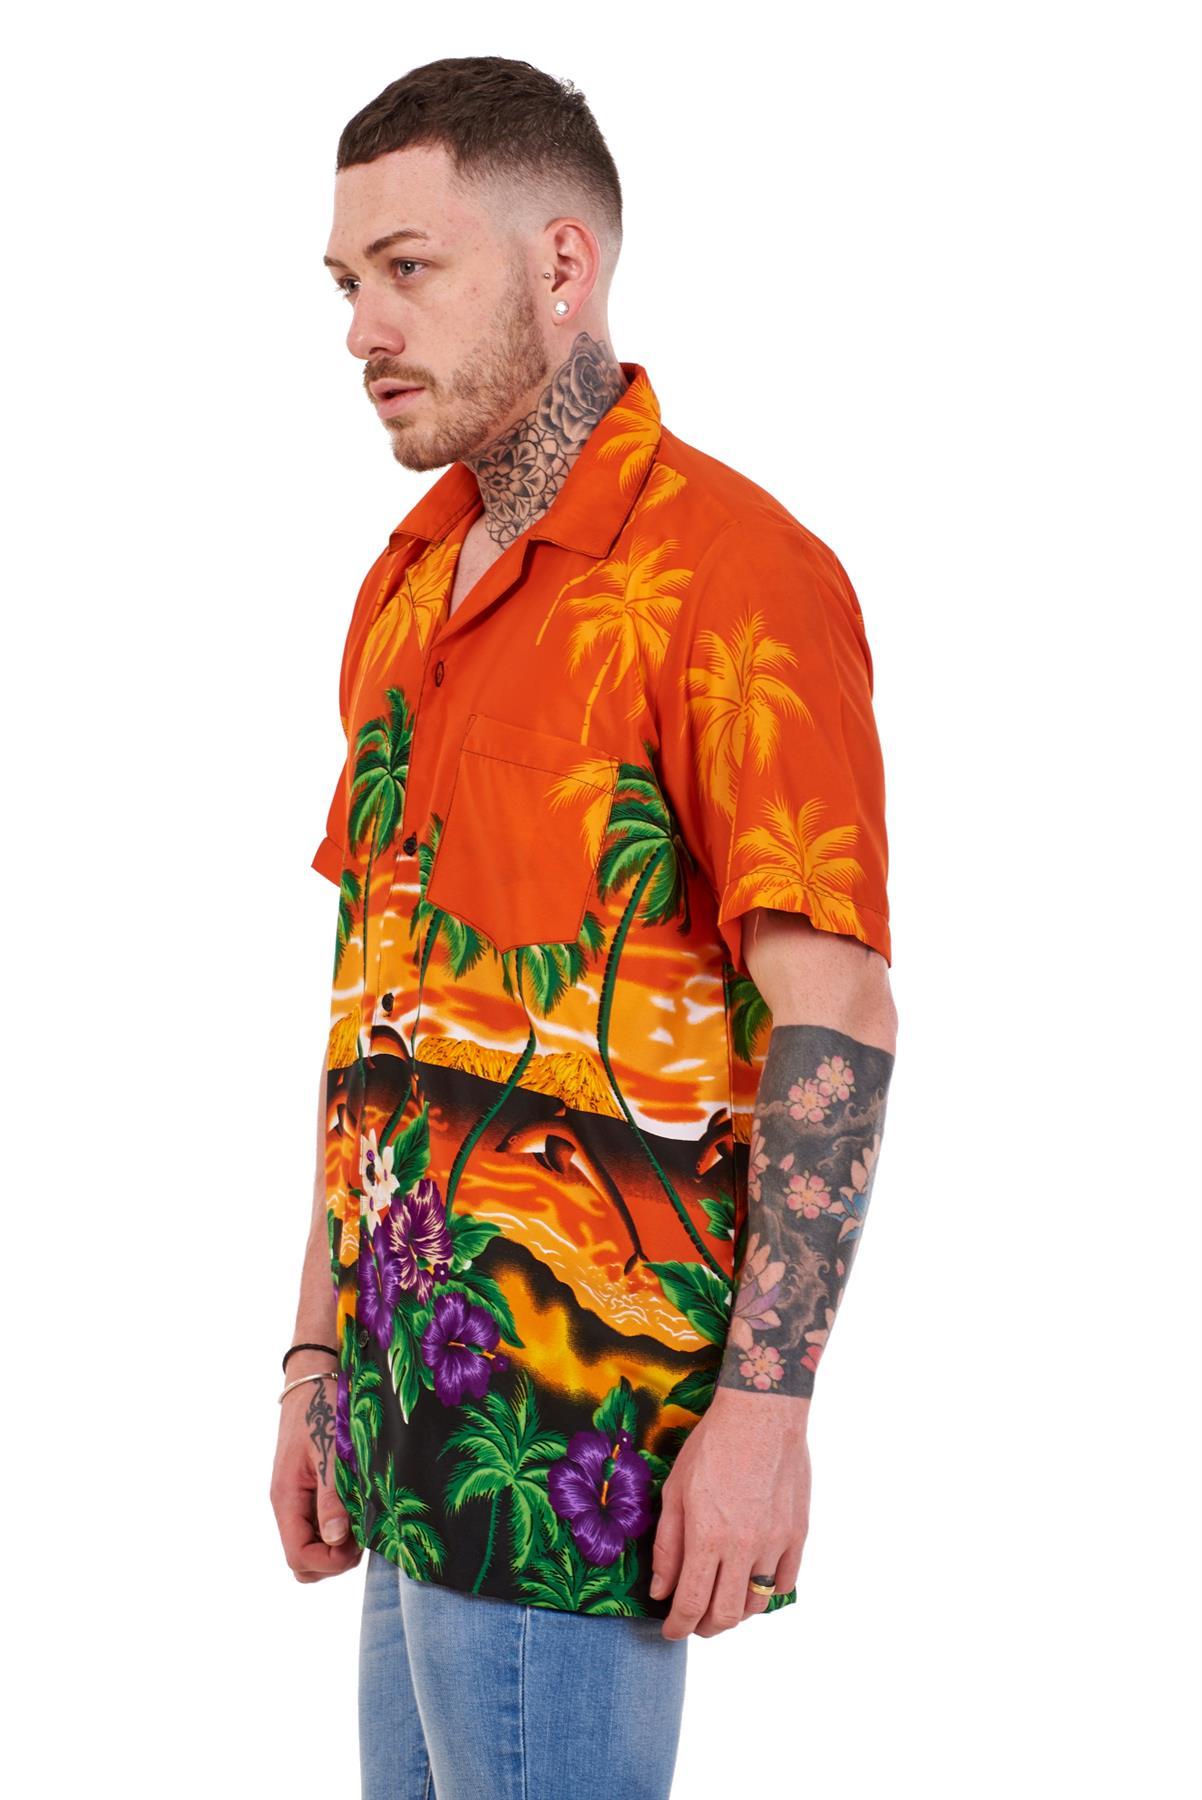 Mens-Hawaiian-Shirt-Multi-Colors-Print-Regular-Big-Size-Summer-Fancy-Dress-M-5XL thumbnail 23